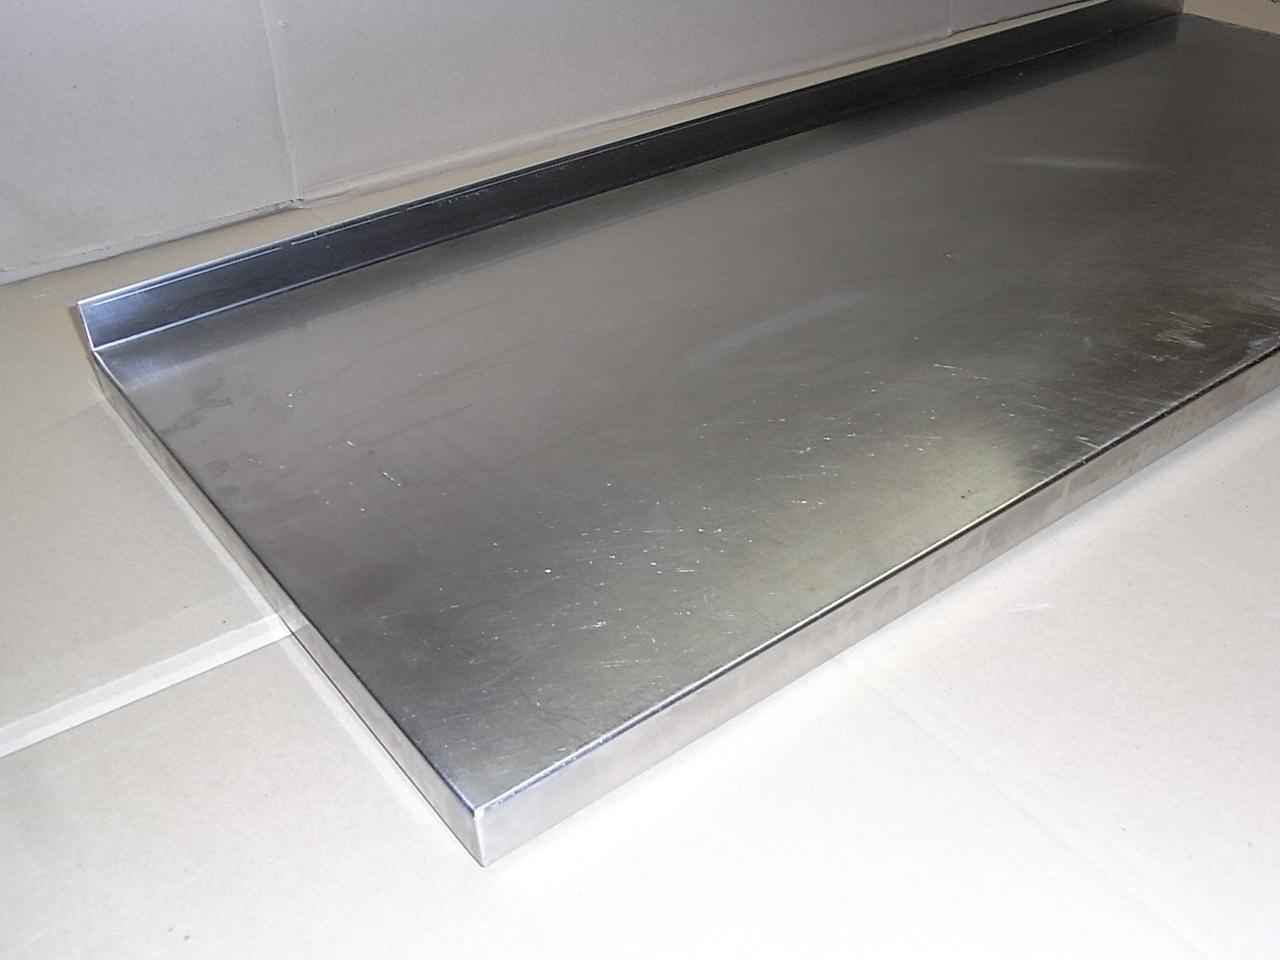 edelstahl arbeitsplatte mit aufkantung anrichtplatte edelstahlplatte 100 x 40 cm ebay. Black Bedroom Furniture Sets. Home Design Ideas